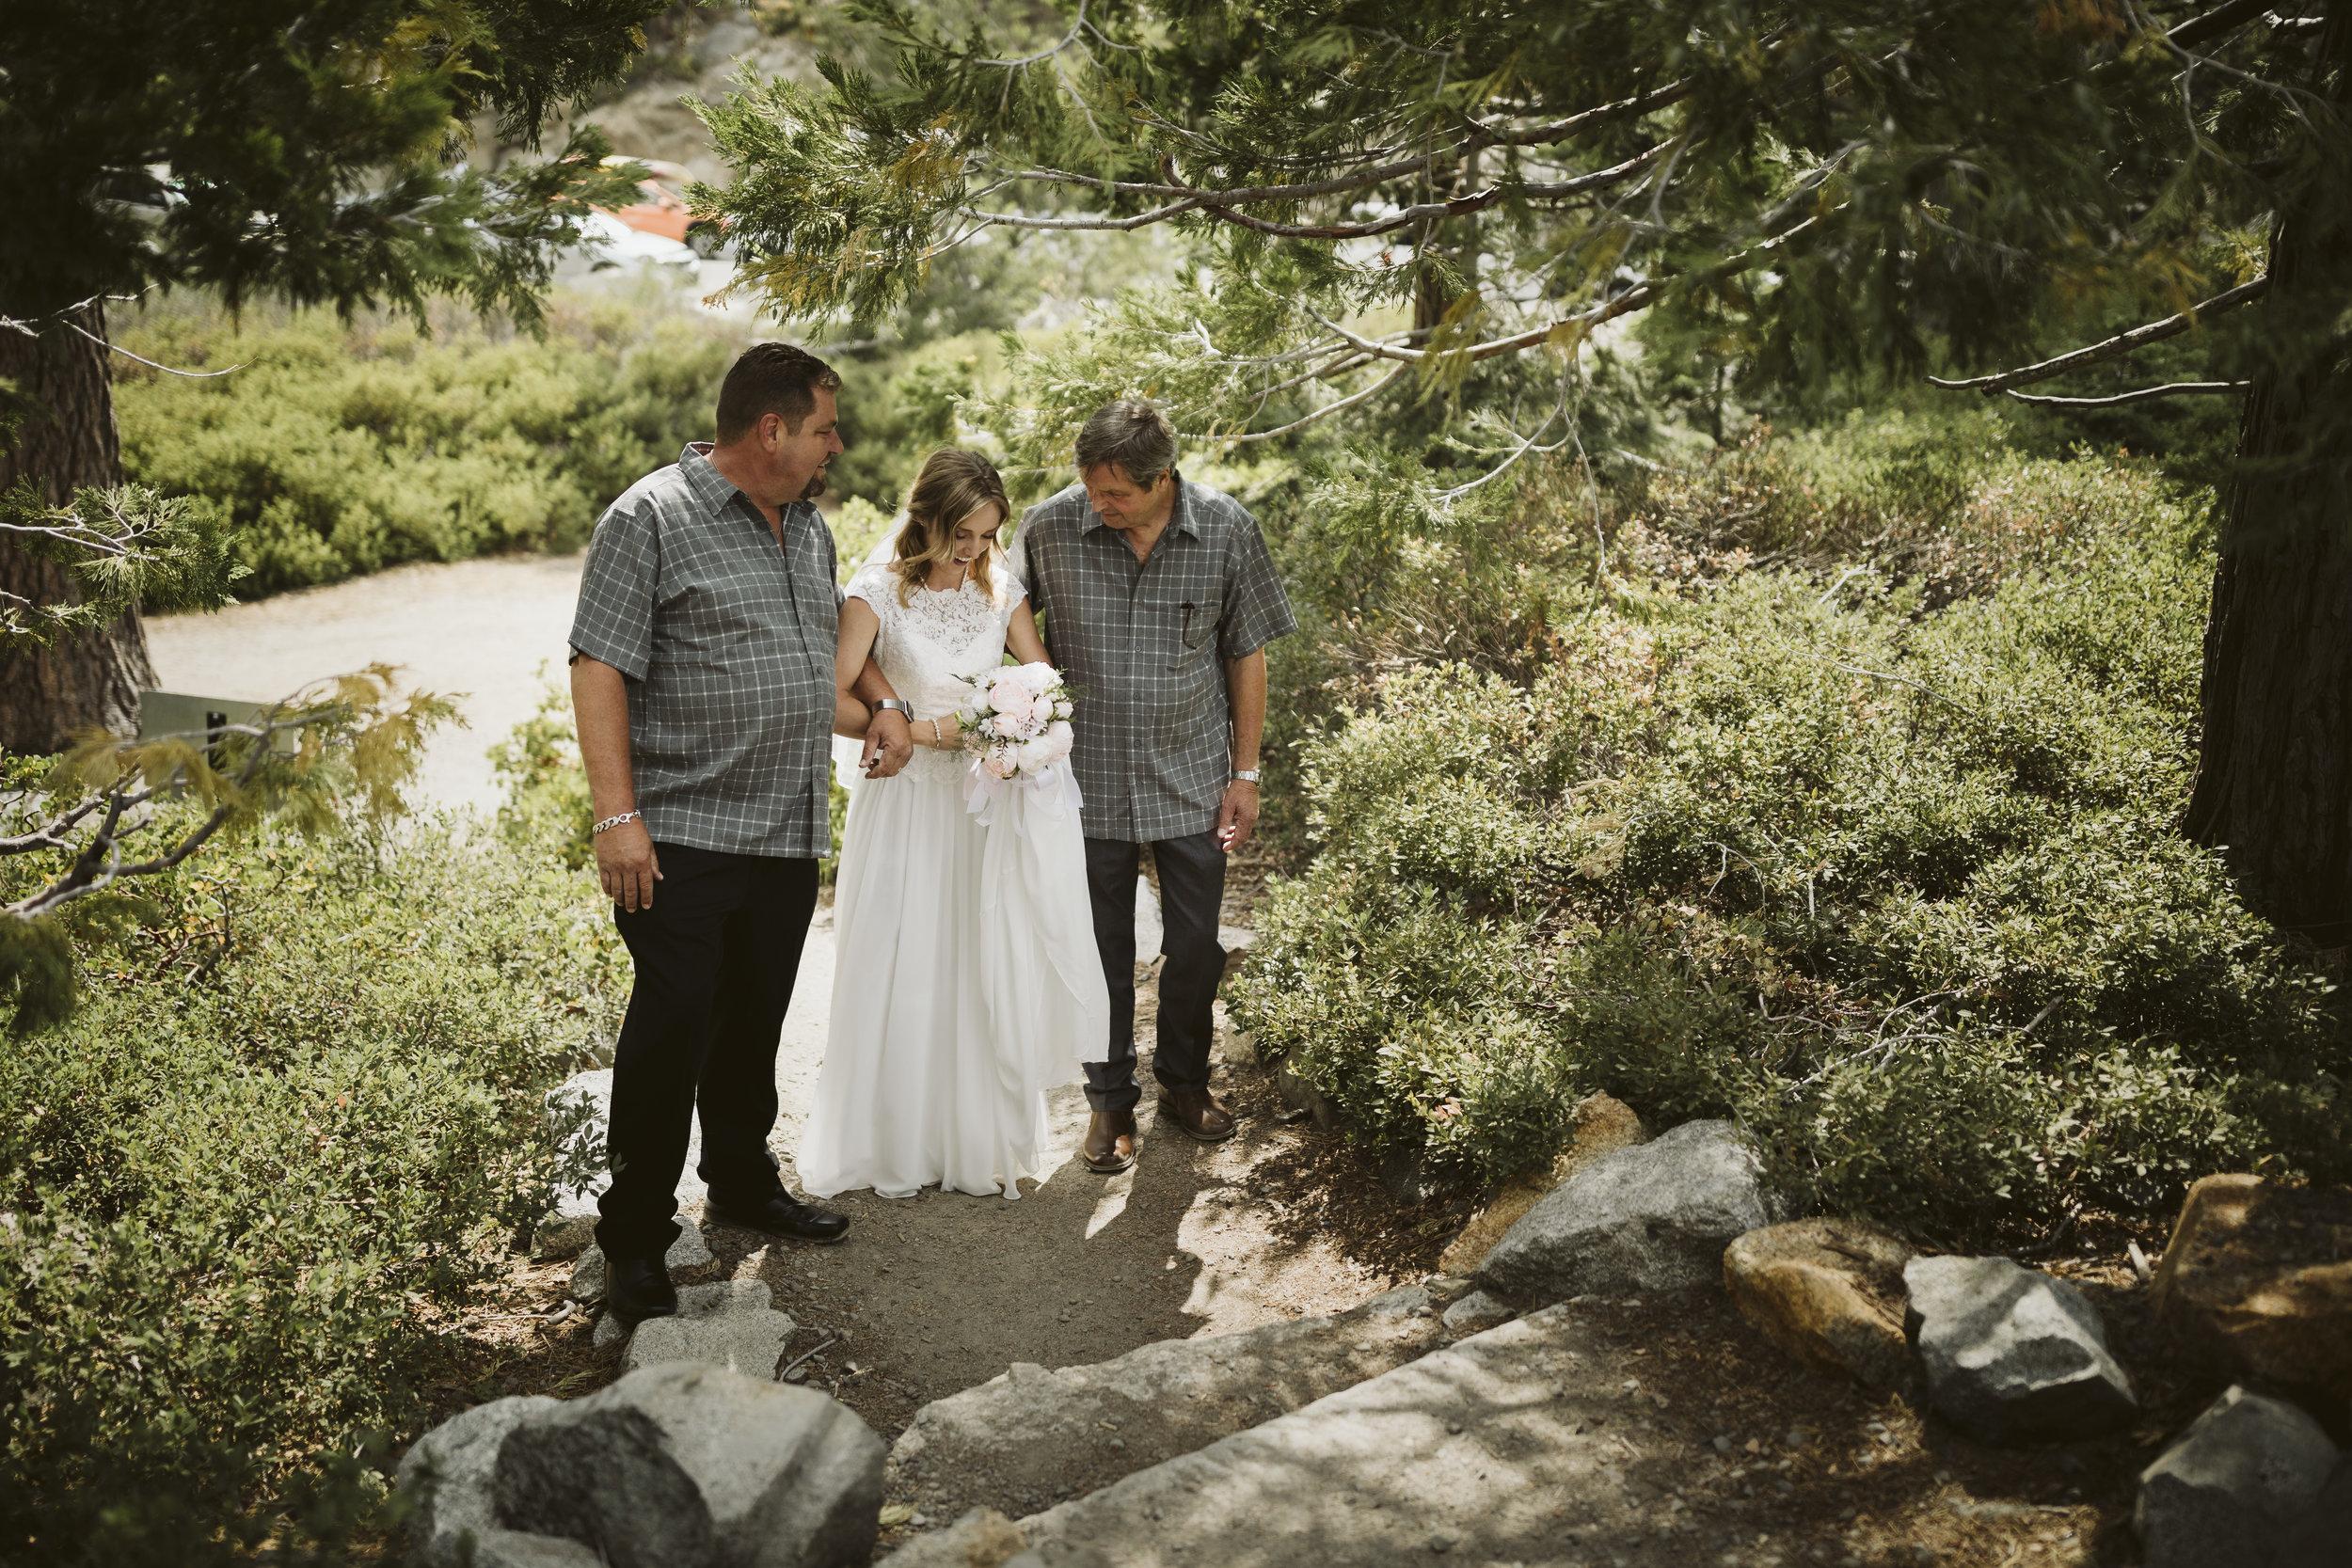 0M7A0650vildphotography-adventurewedding-adventurouswedding-tahoewedding-laketahoewedding-adventureelopement-laketahoeweddingphotographer-wedding-photographer-weddingphotographer-Chase-Sam.jpg